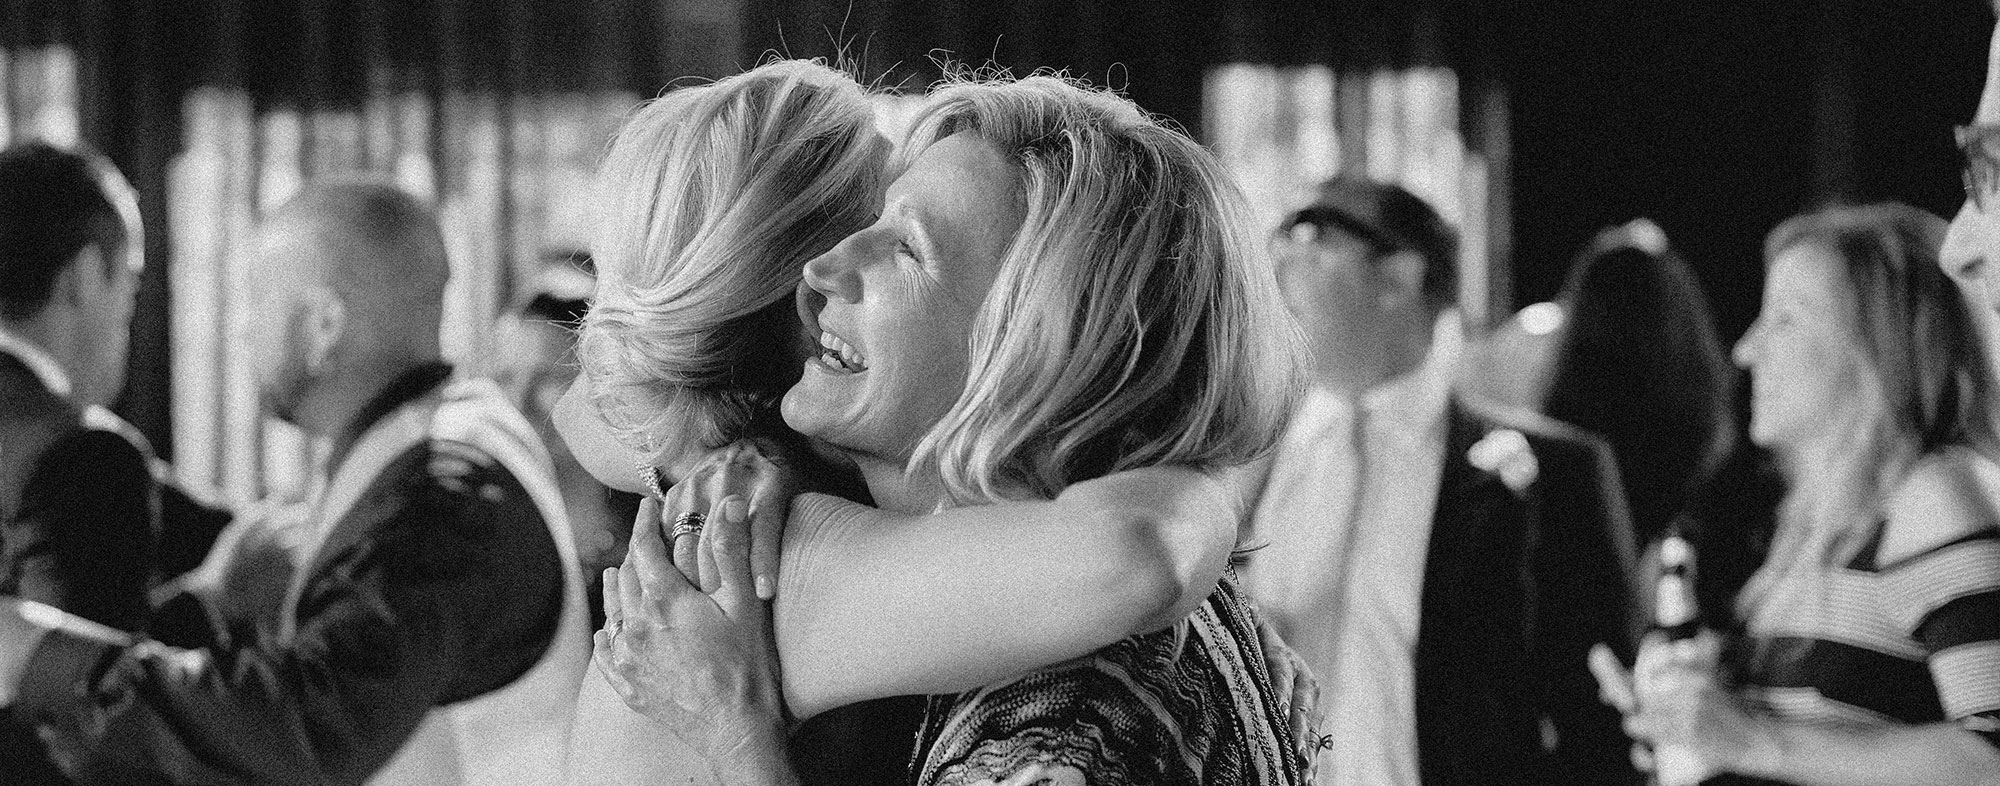 mother-daughter-hug.jpg